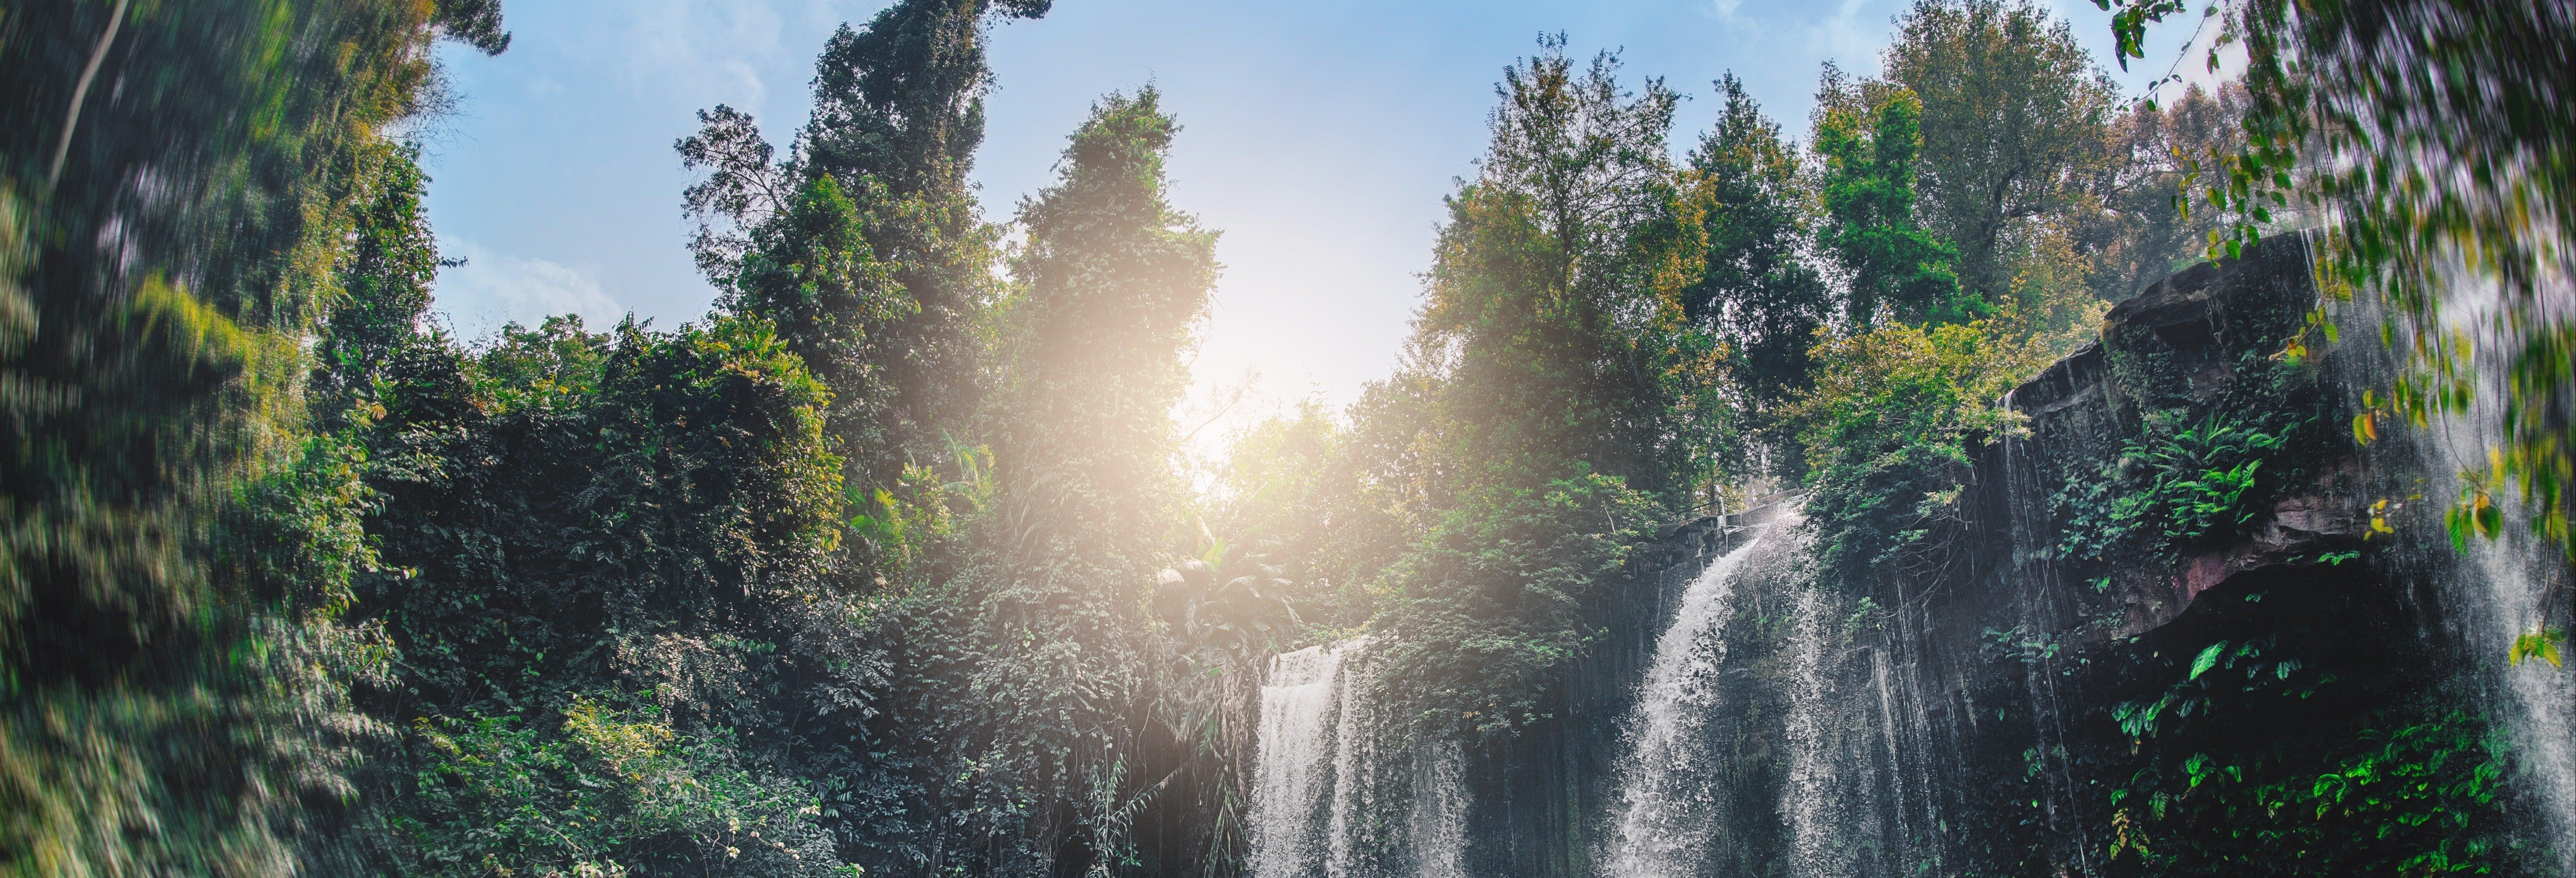 Excursão a Phnom Kulen